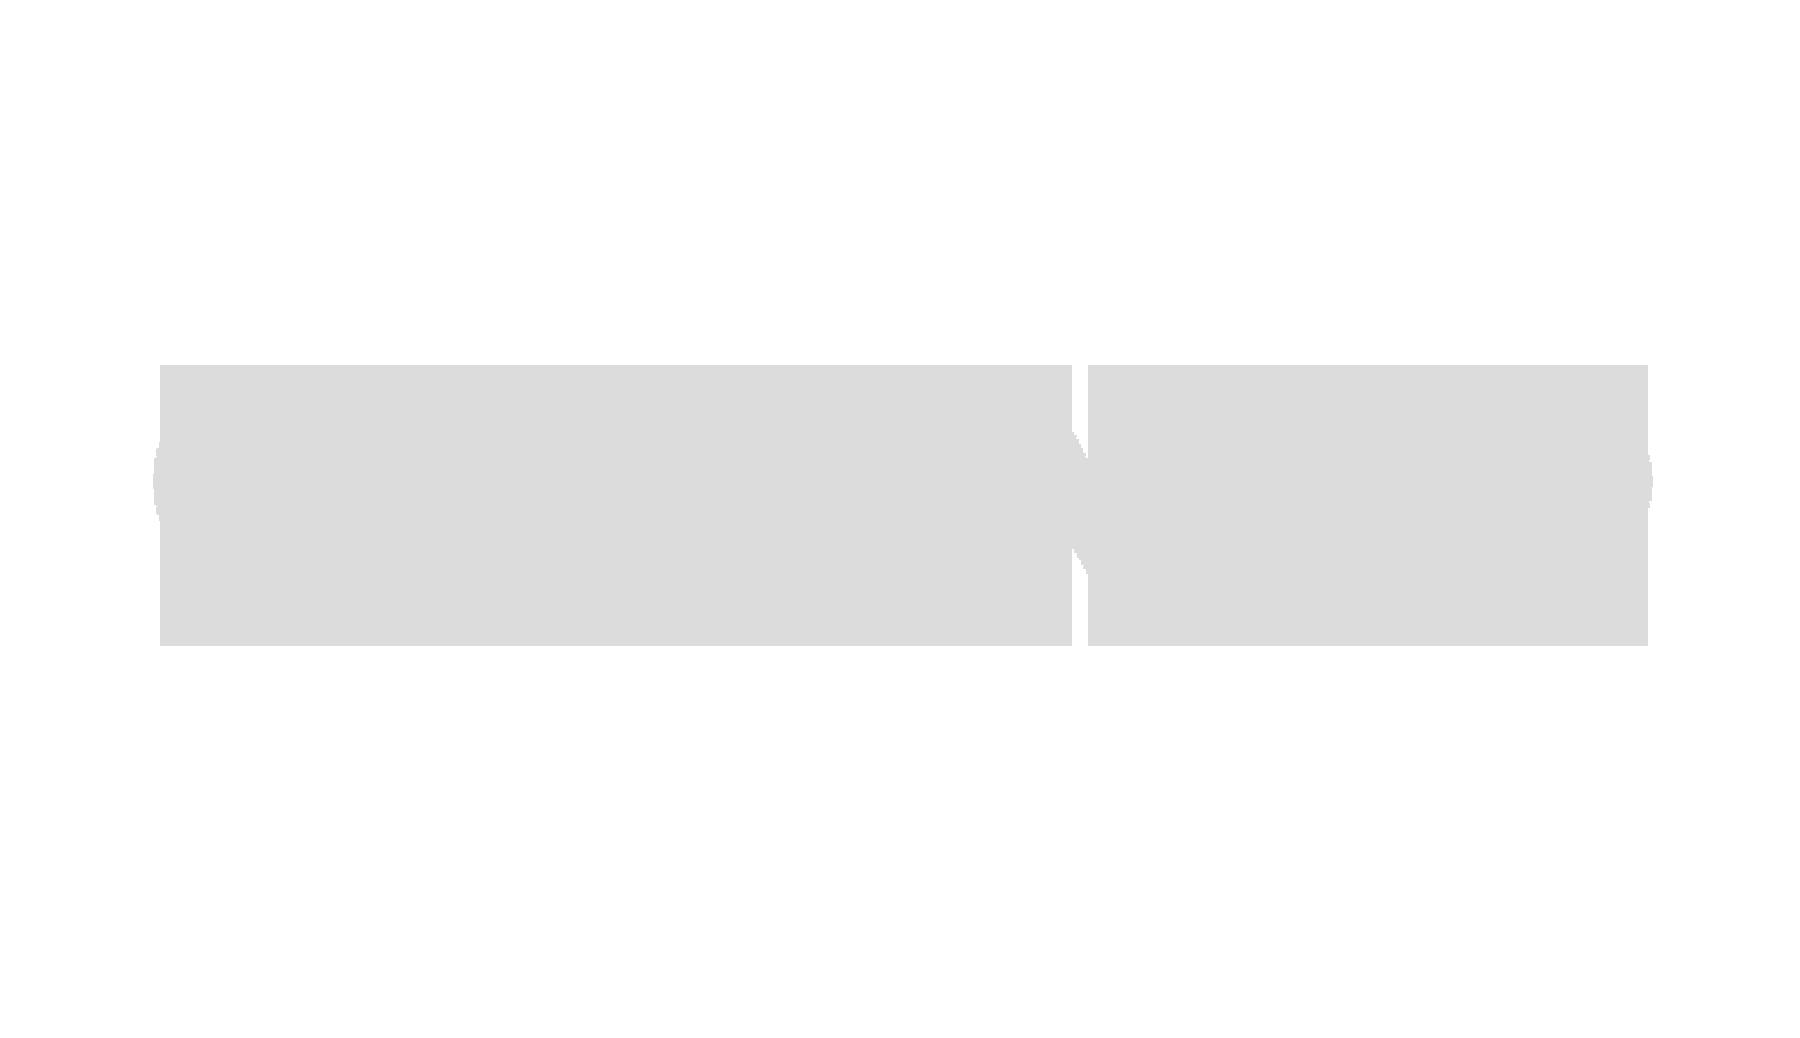 POINTP_G